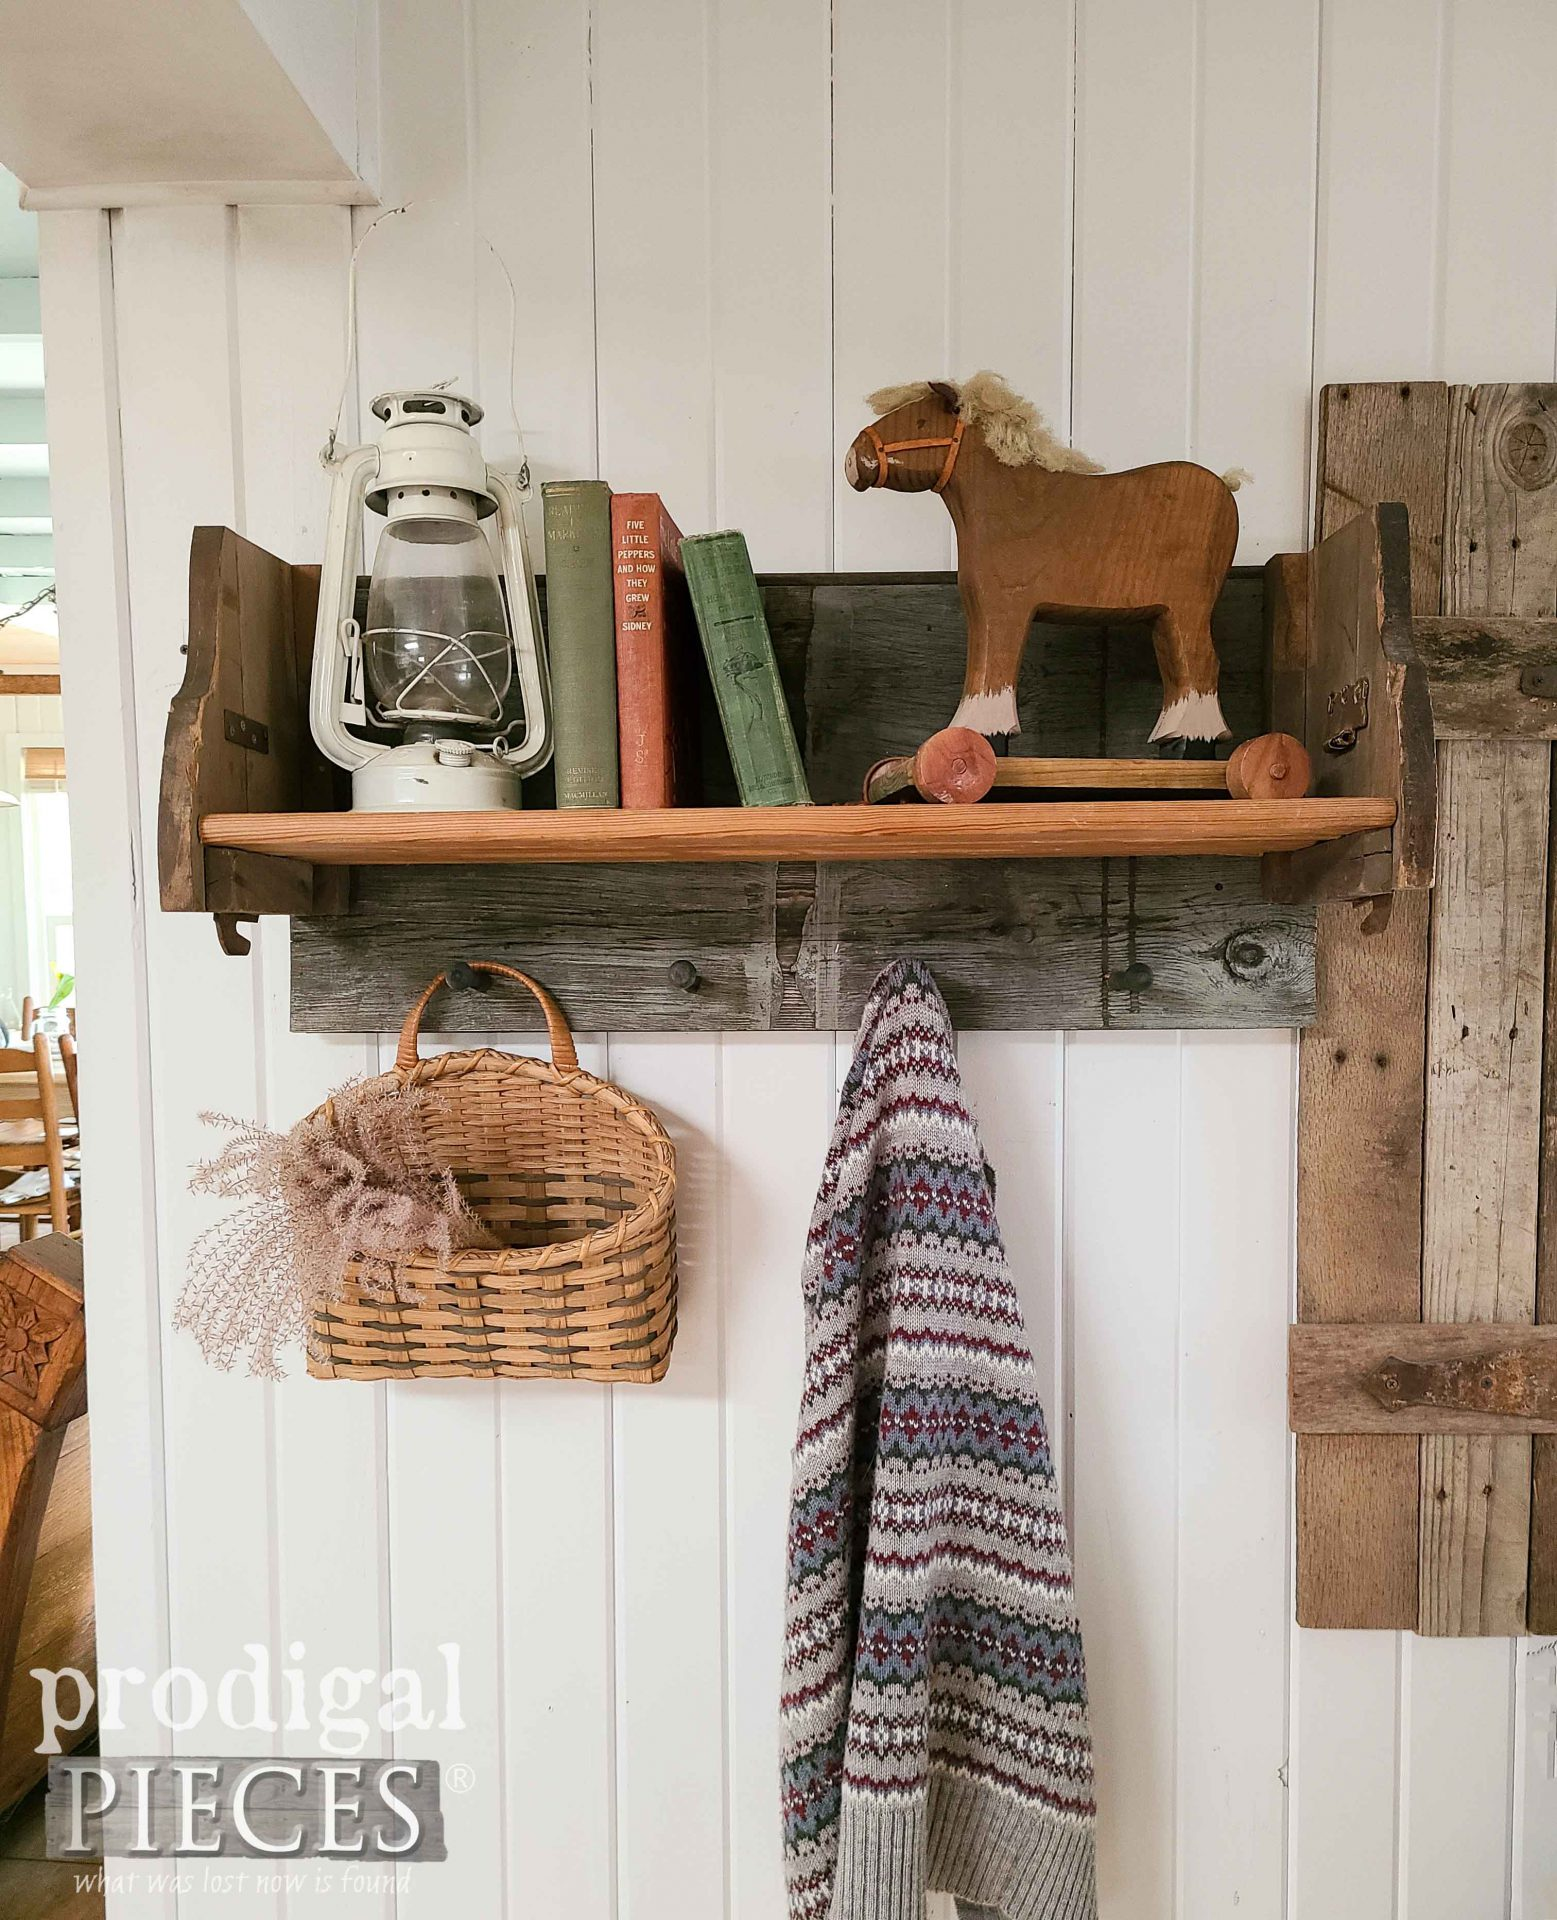 DIY Farmhouse Shelf Rack with Shaker Pegs by Larissa of Prodigal Pieces   prodigalpieces.com #prodigalpieces #farmhouse #diy #home #homedecor